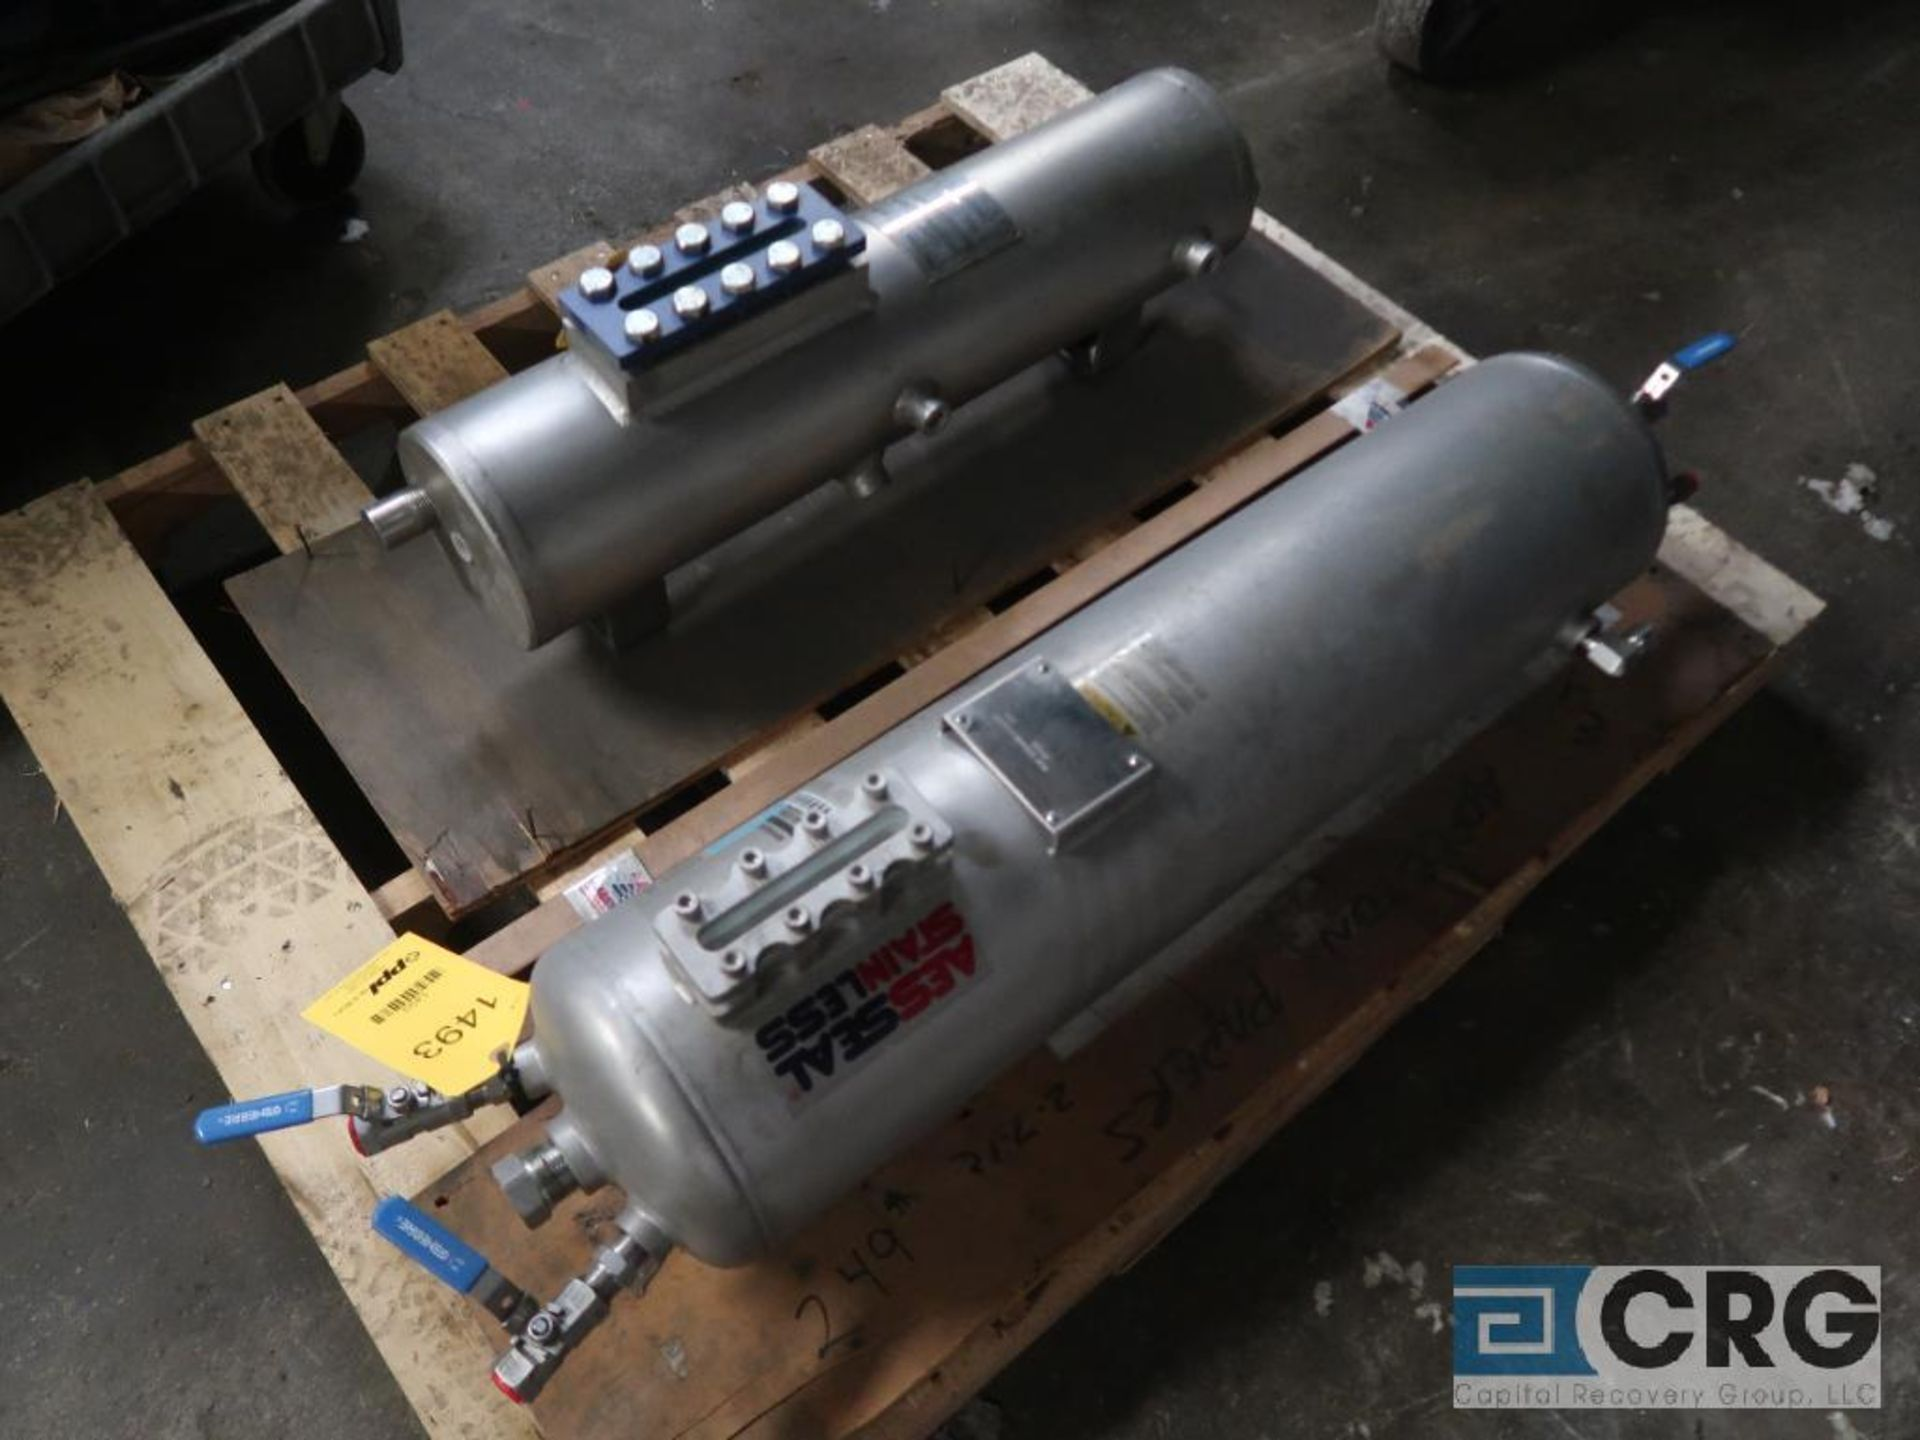 Lot of (2) stainless fluid reservoir tanks, (1) Aessteal SSE25, and (1) John Crane LMLF-